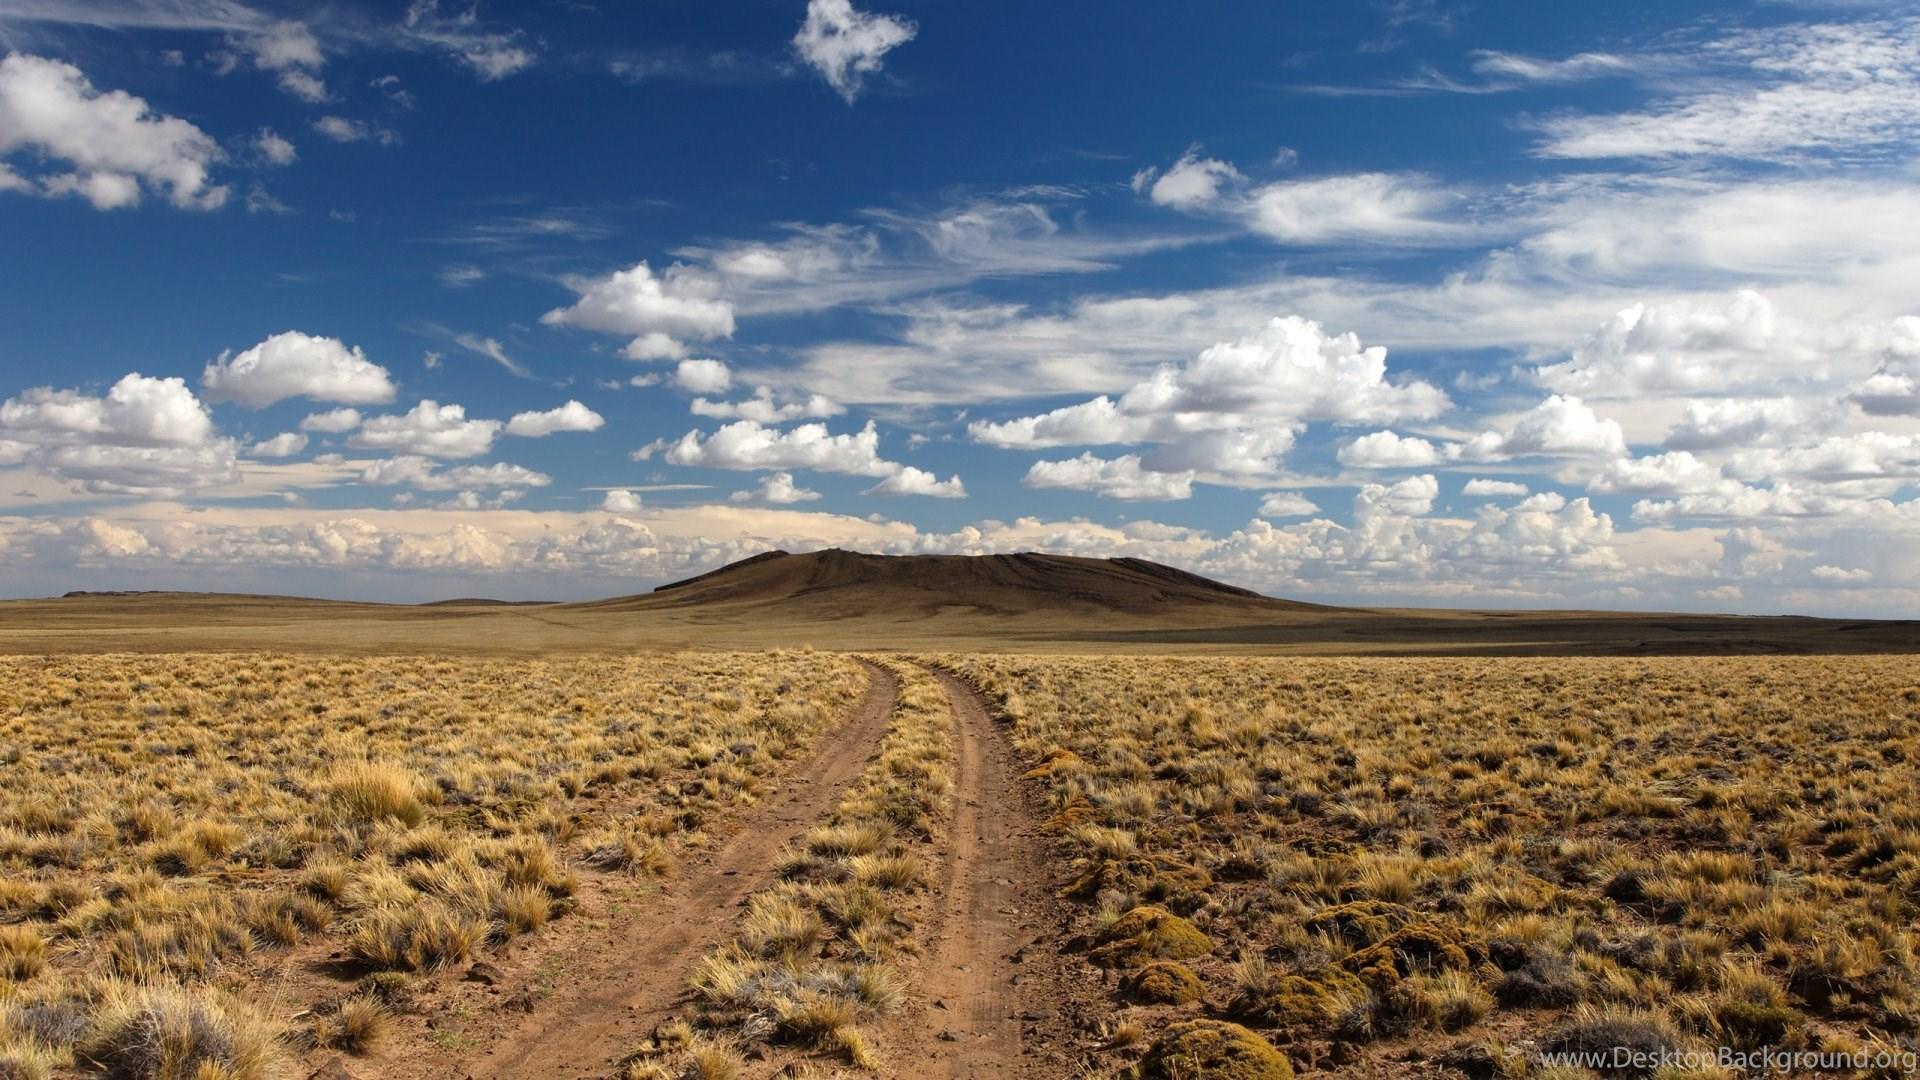 Full HD 1080p Desert Wallpapers HD, Desktop Backgrounds